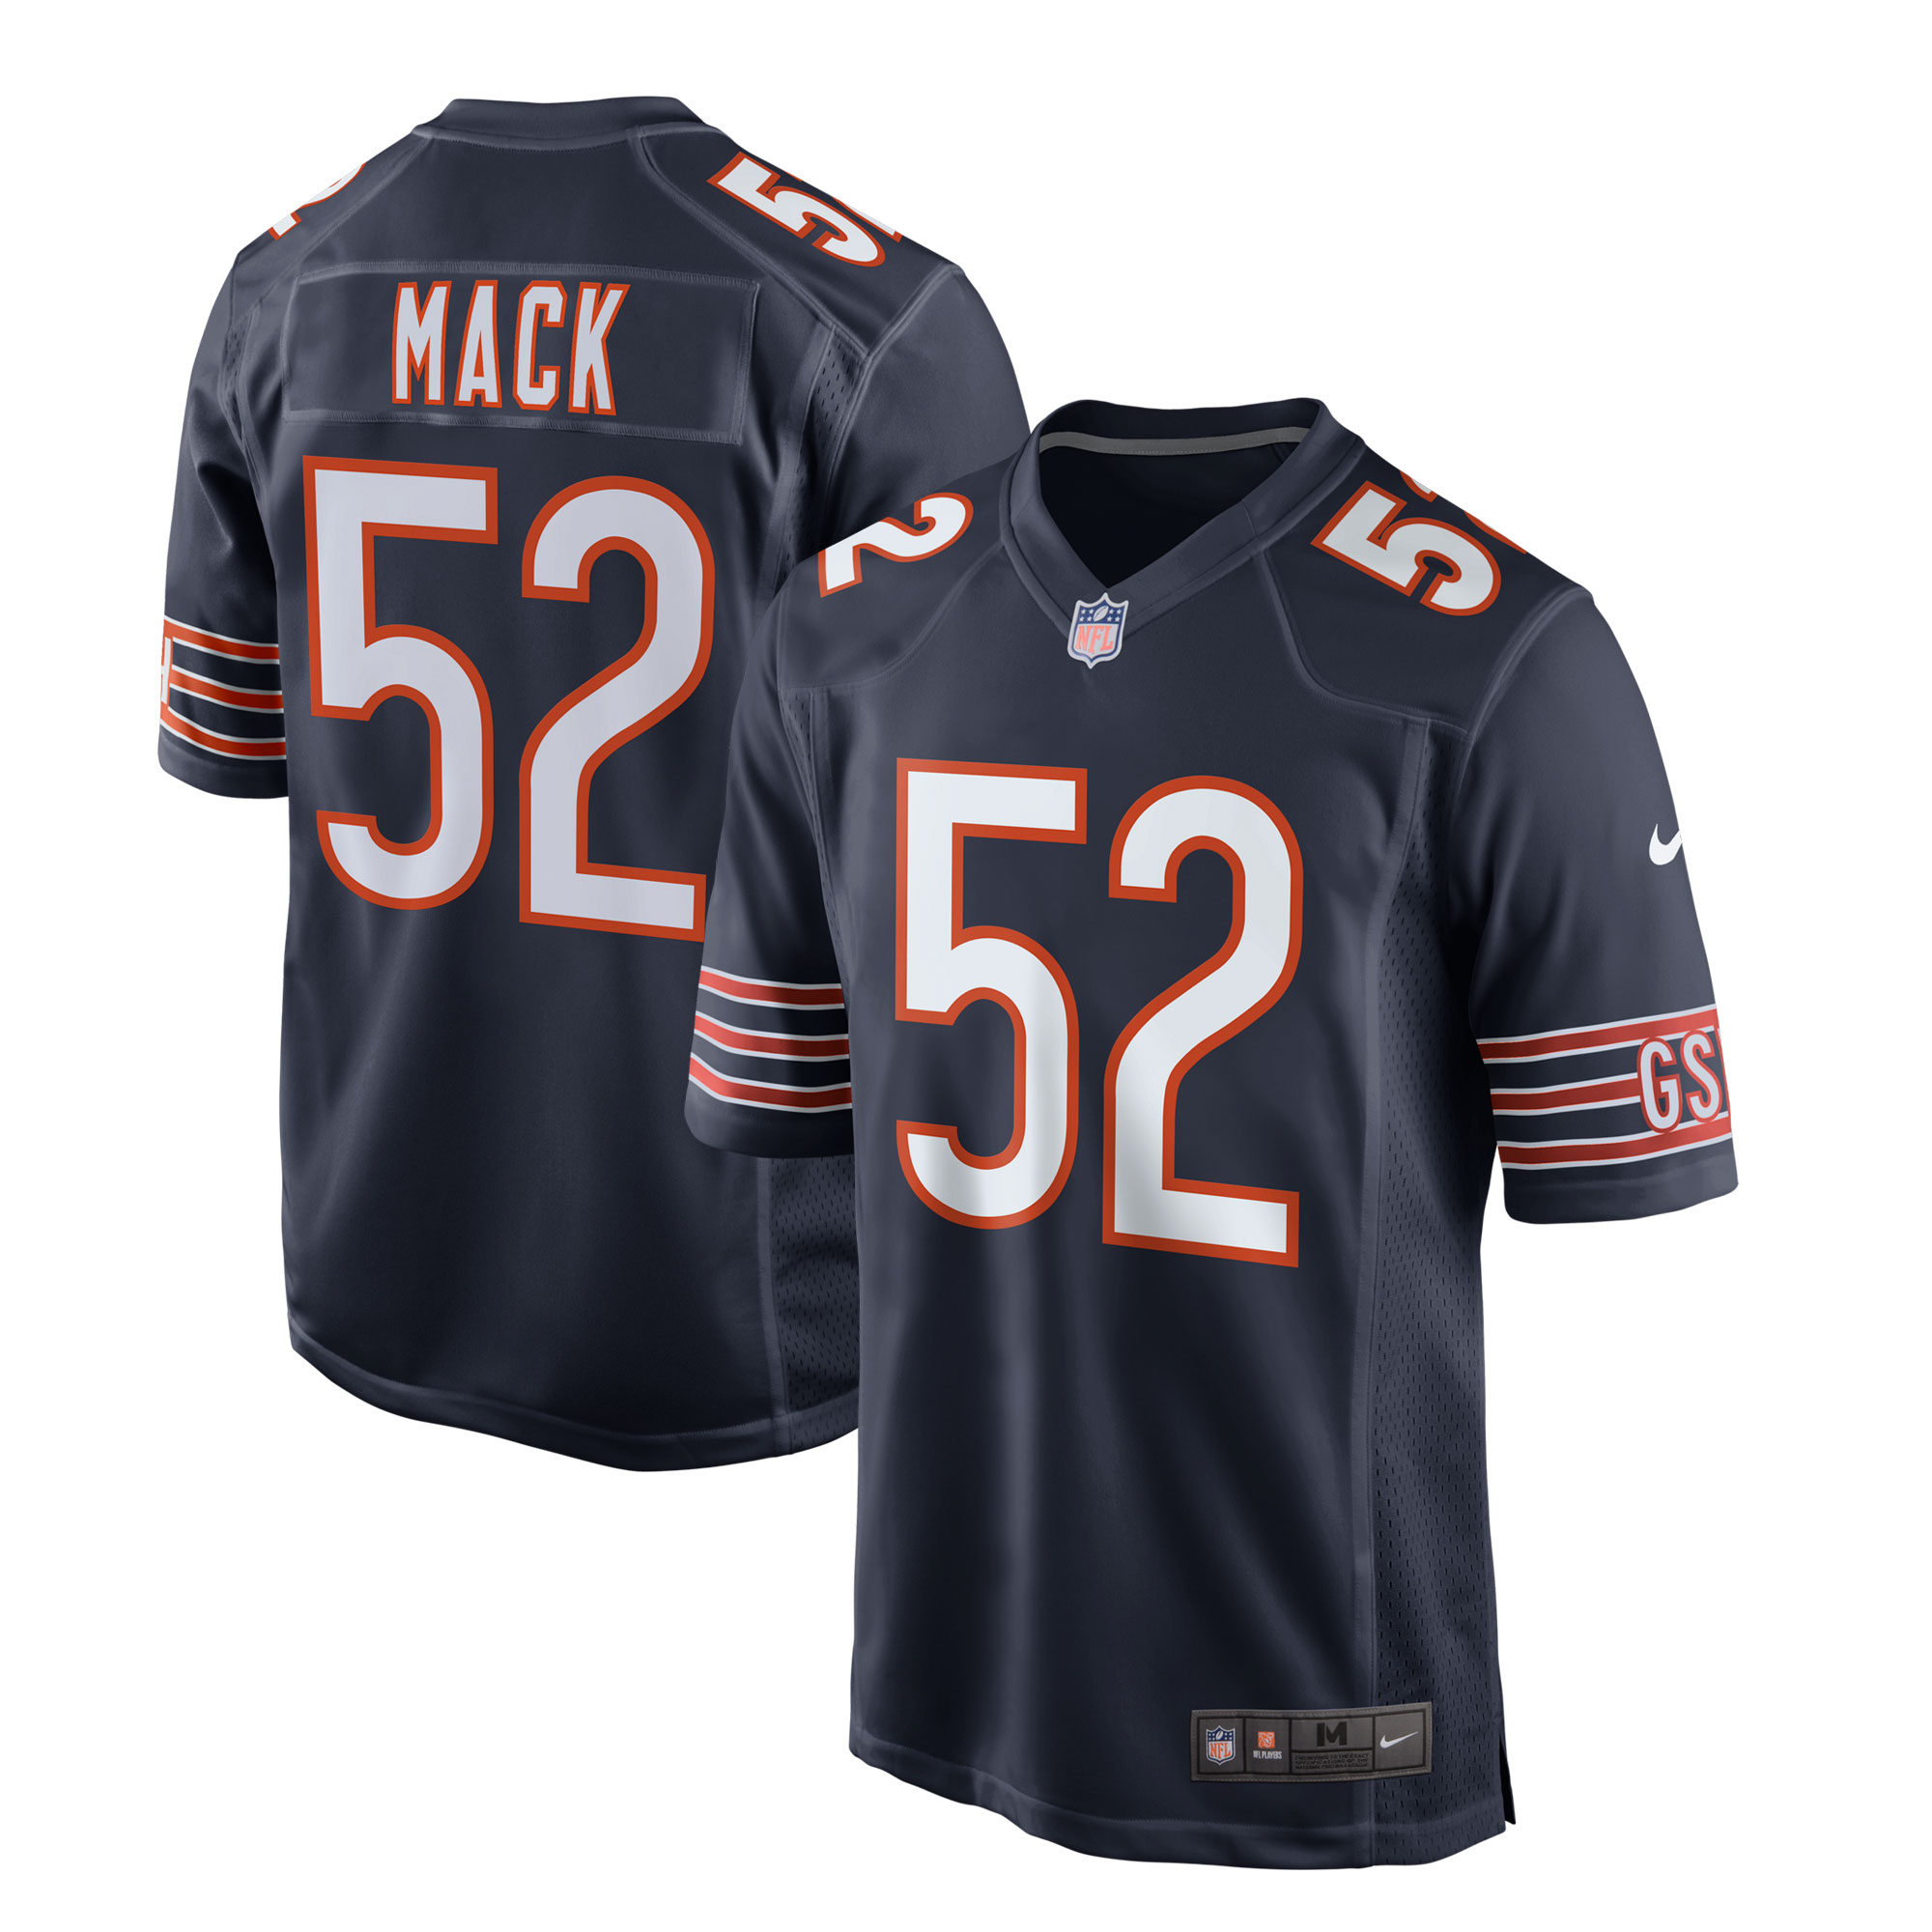 NFL Fan Shop - Walmart.com be3820aaf